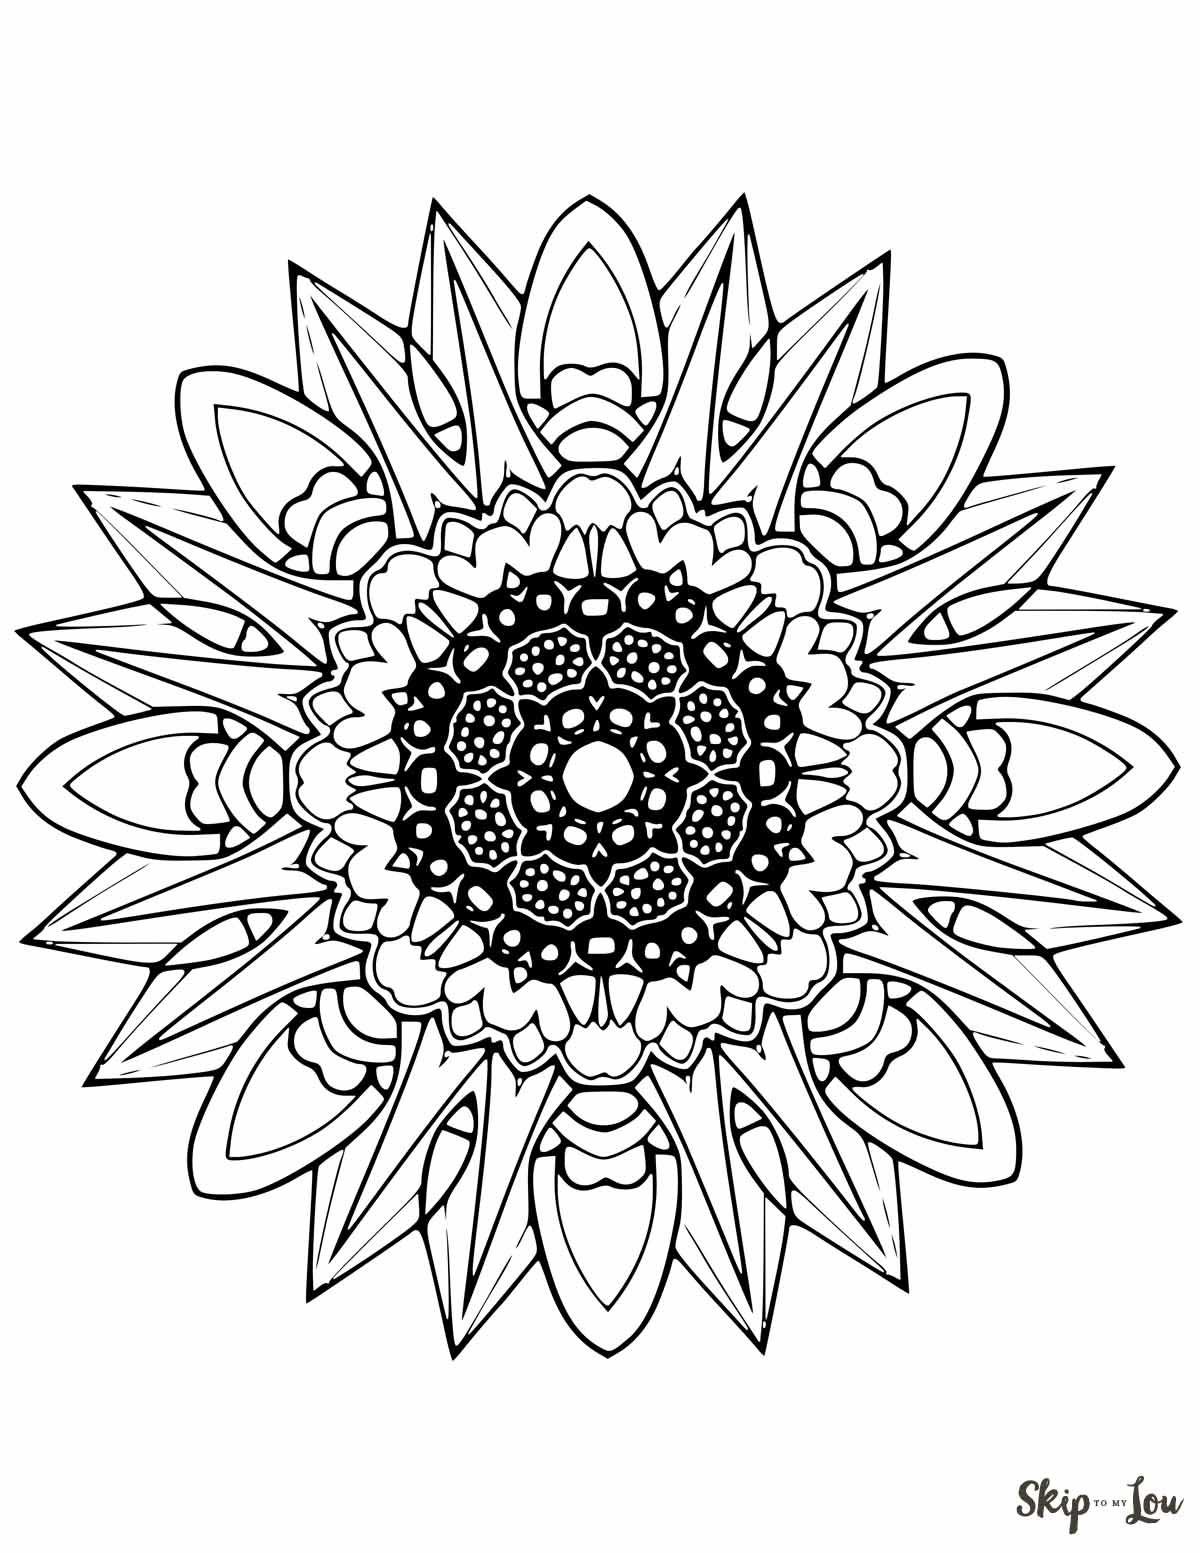 Beautiful Free Mandala Coloring Pages Mandala Coloring Pages Mandala Coloring Books Mandala Coloring